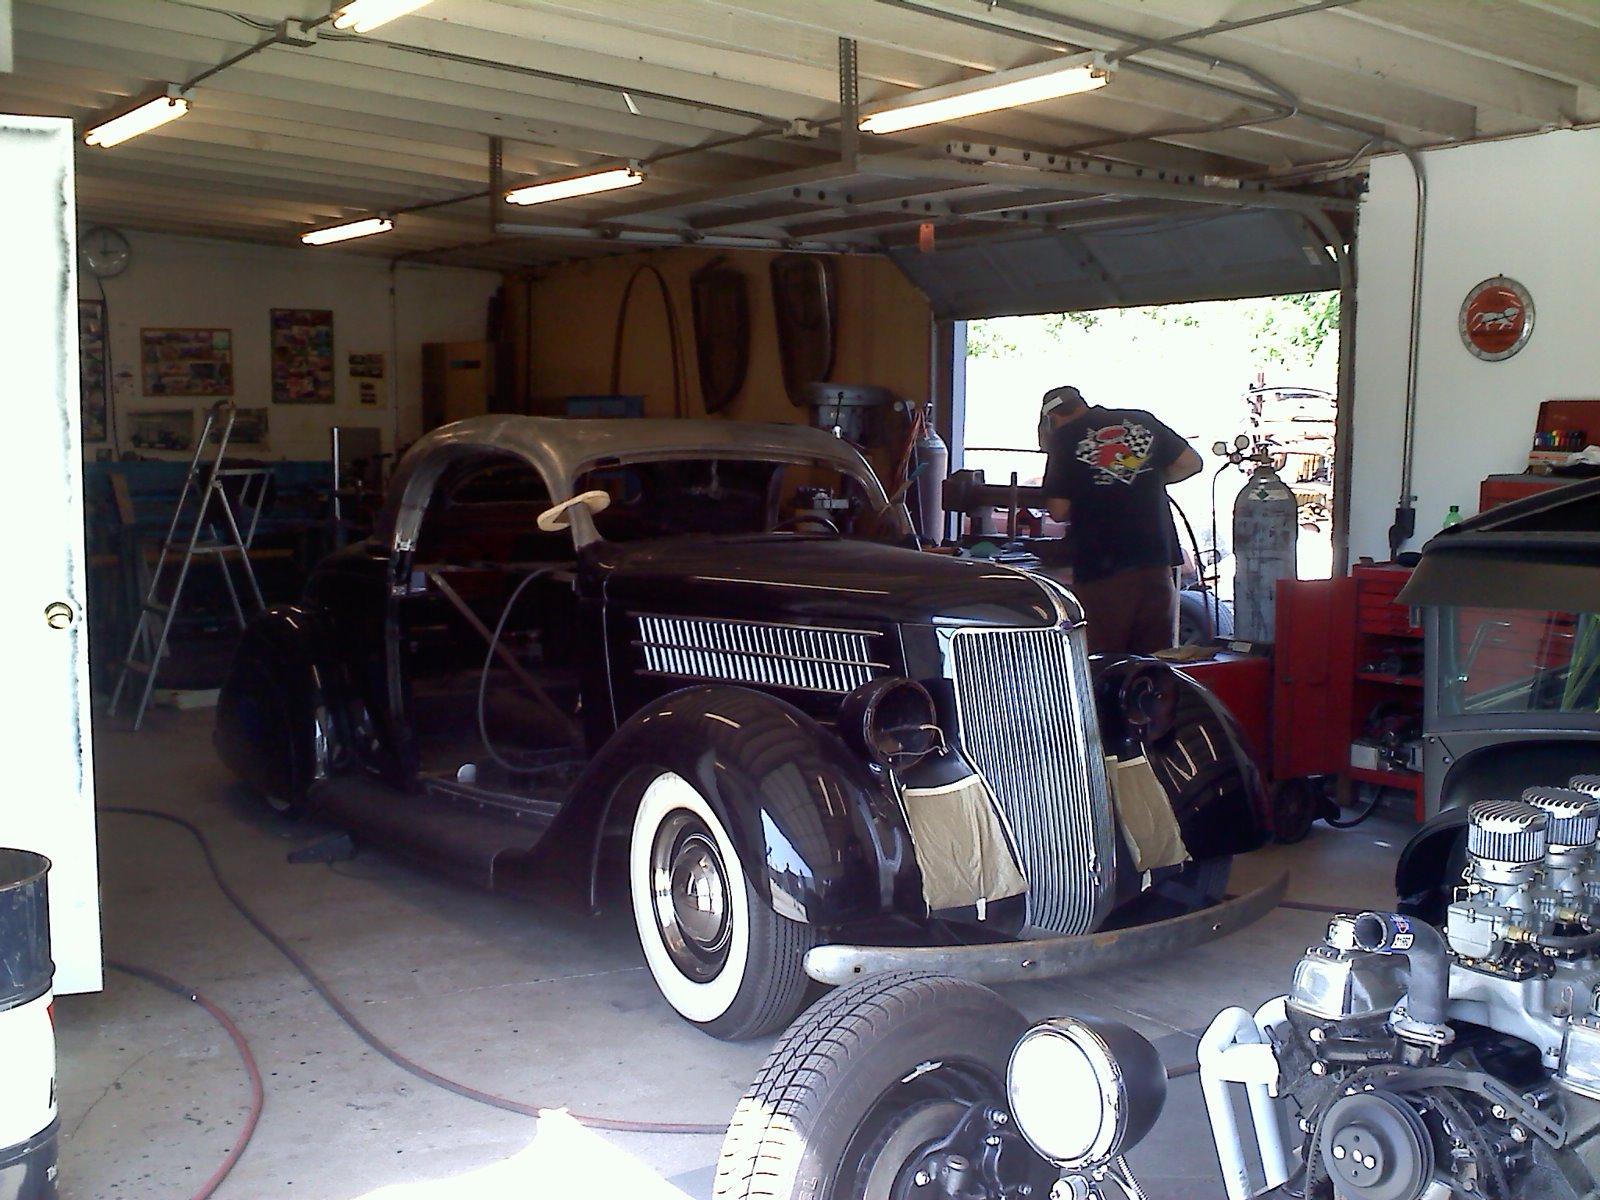 Craigslist 1935 ford sedan autos post for 1936 ford 3 window coupe for sale craigslist